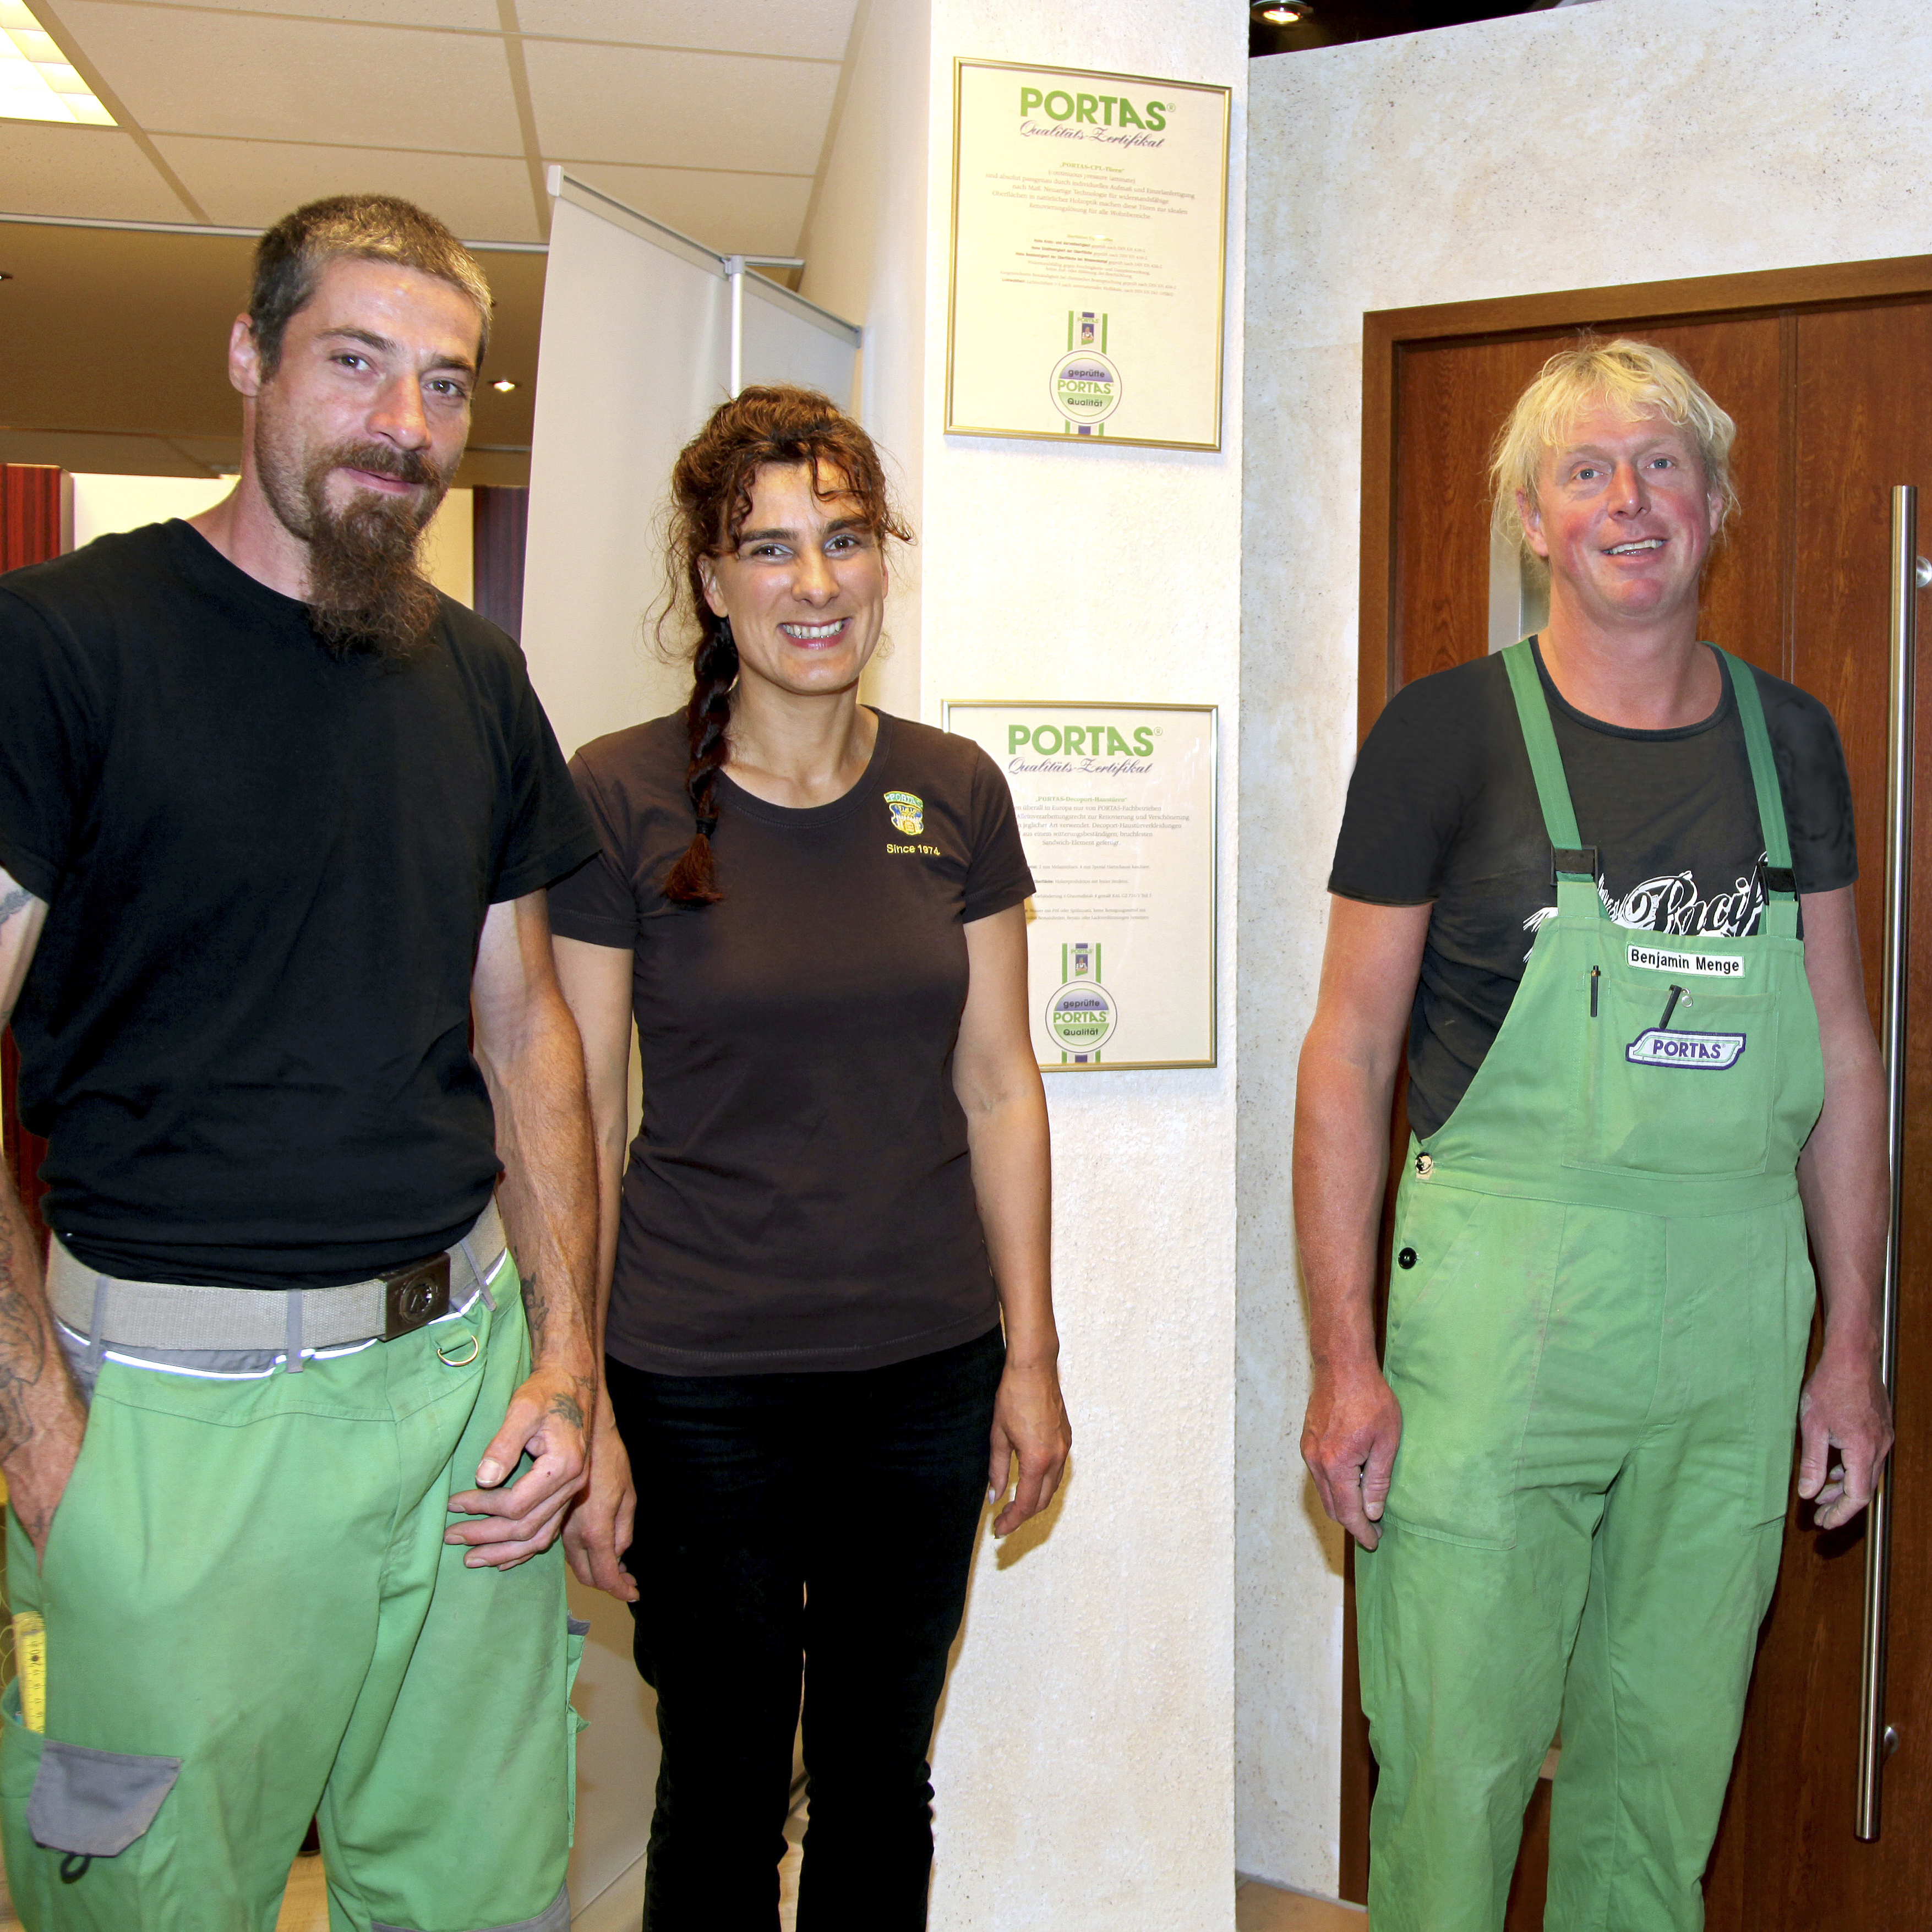 Foto de PORTAS-Fachbetrieb Fuchs Renovierungs GmbH Brotterode-Trusetal